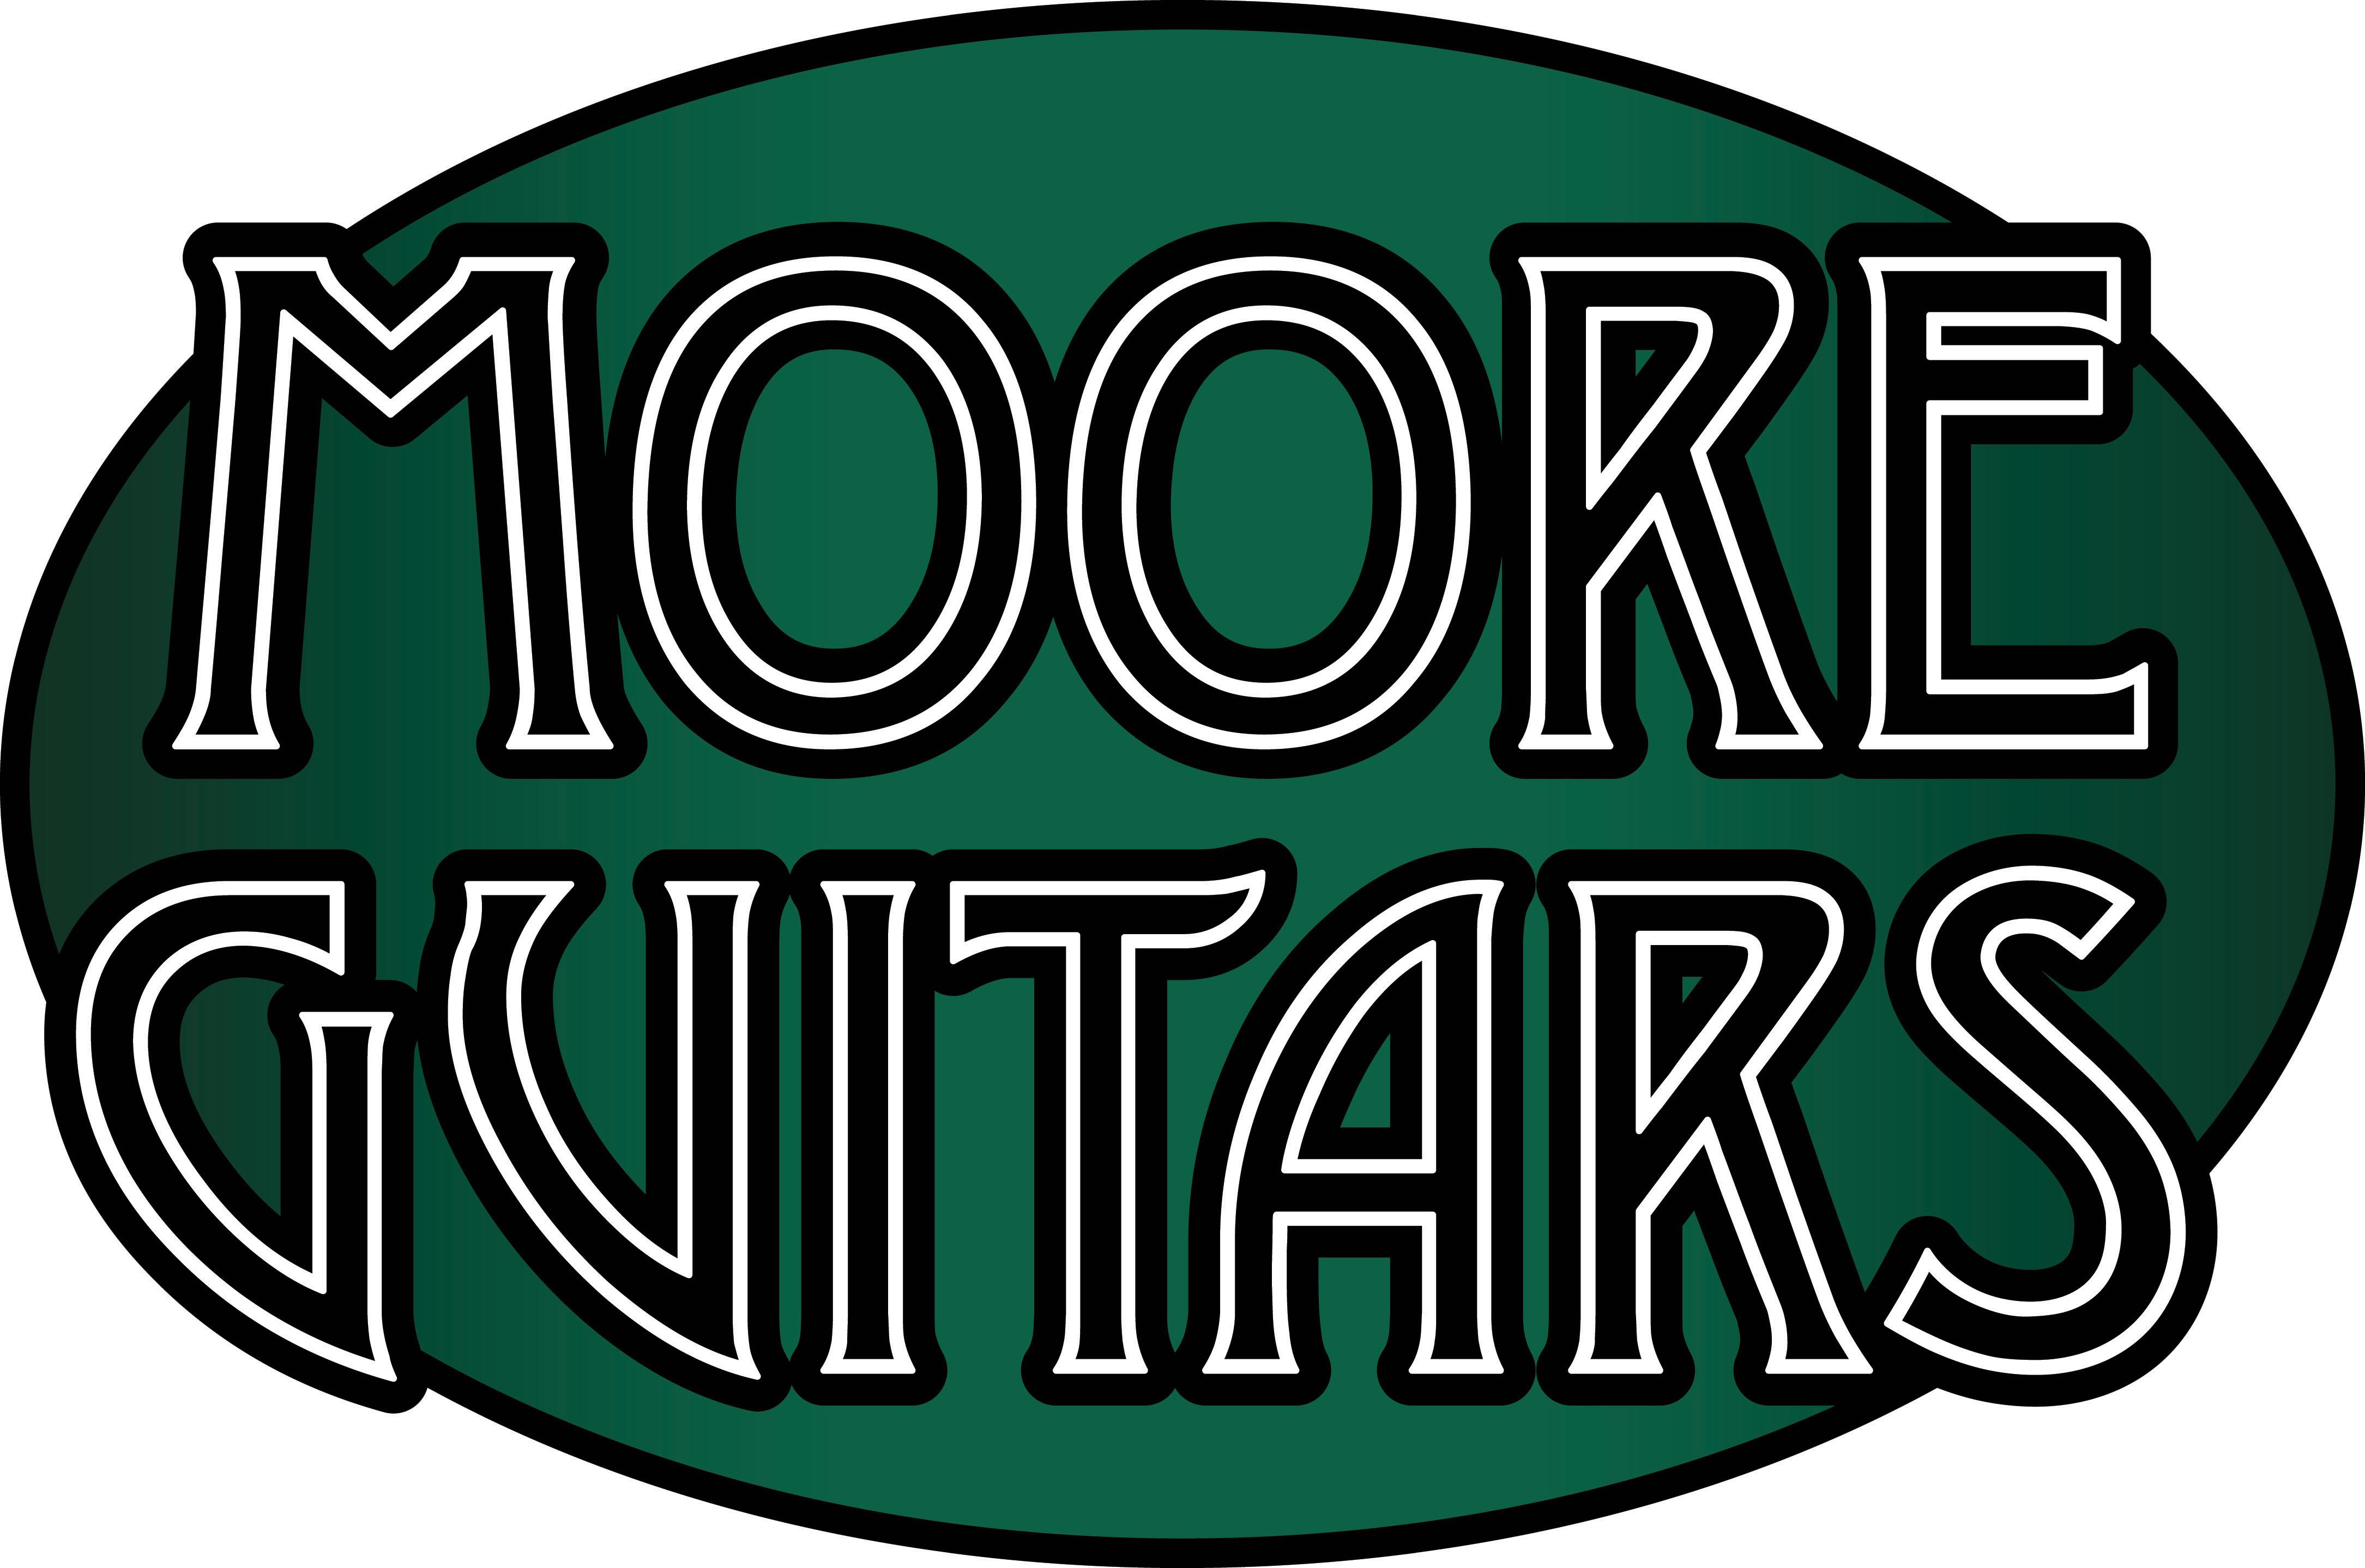 Moore Guitars - Black Owned